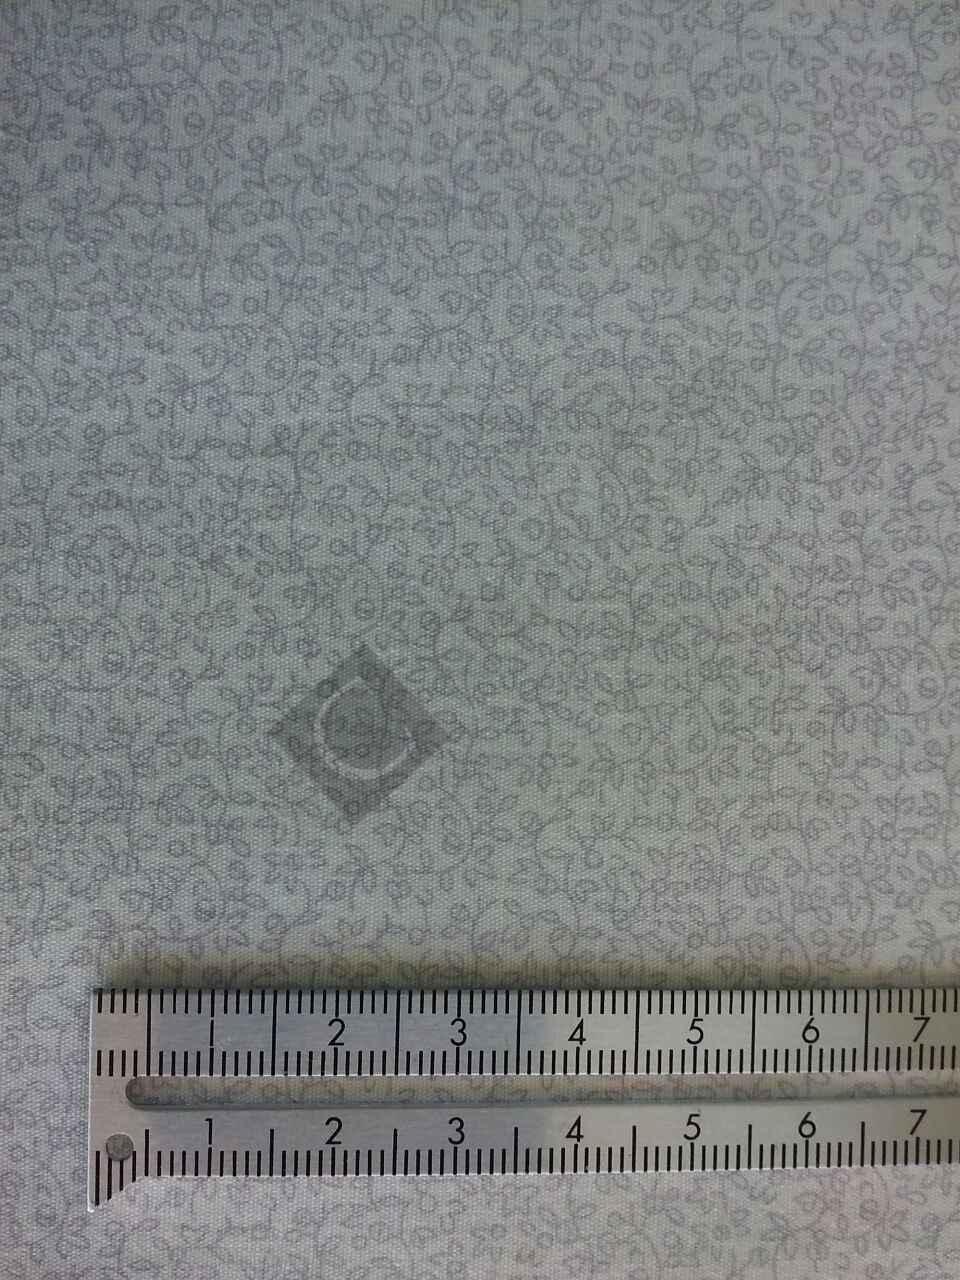 Grey Tiny Leaves - code tba